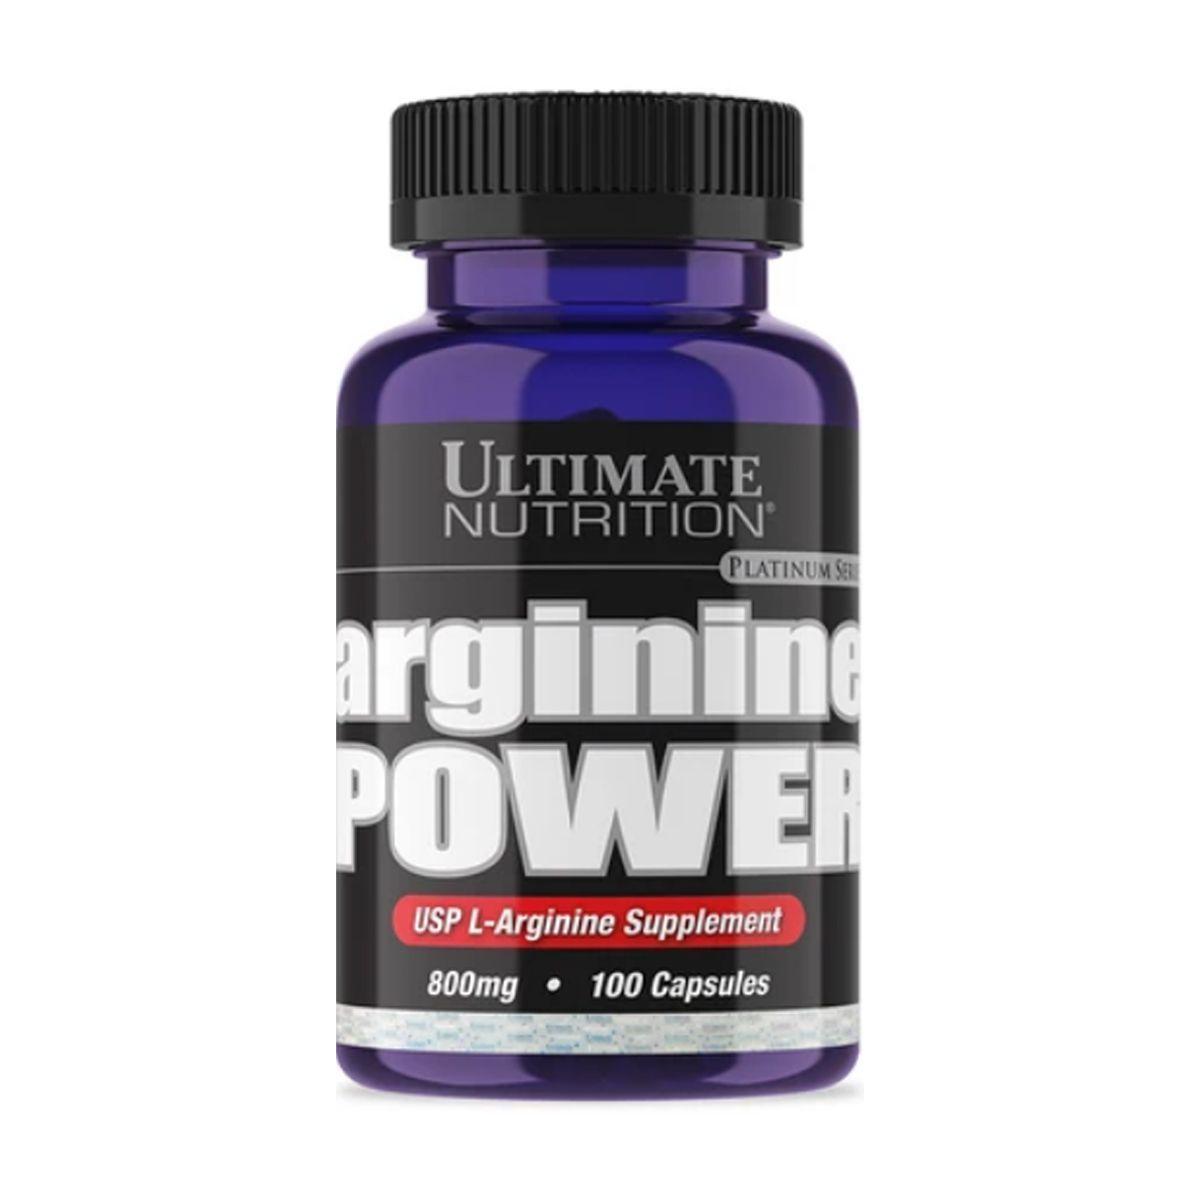 Arginina Powder 800mg 100 cápsulas - Ultimate Nutrition